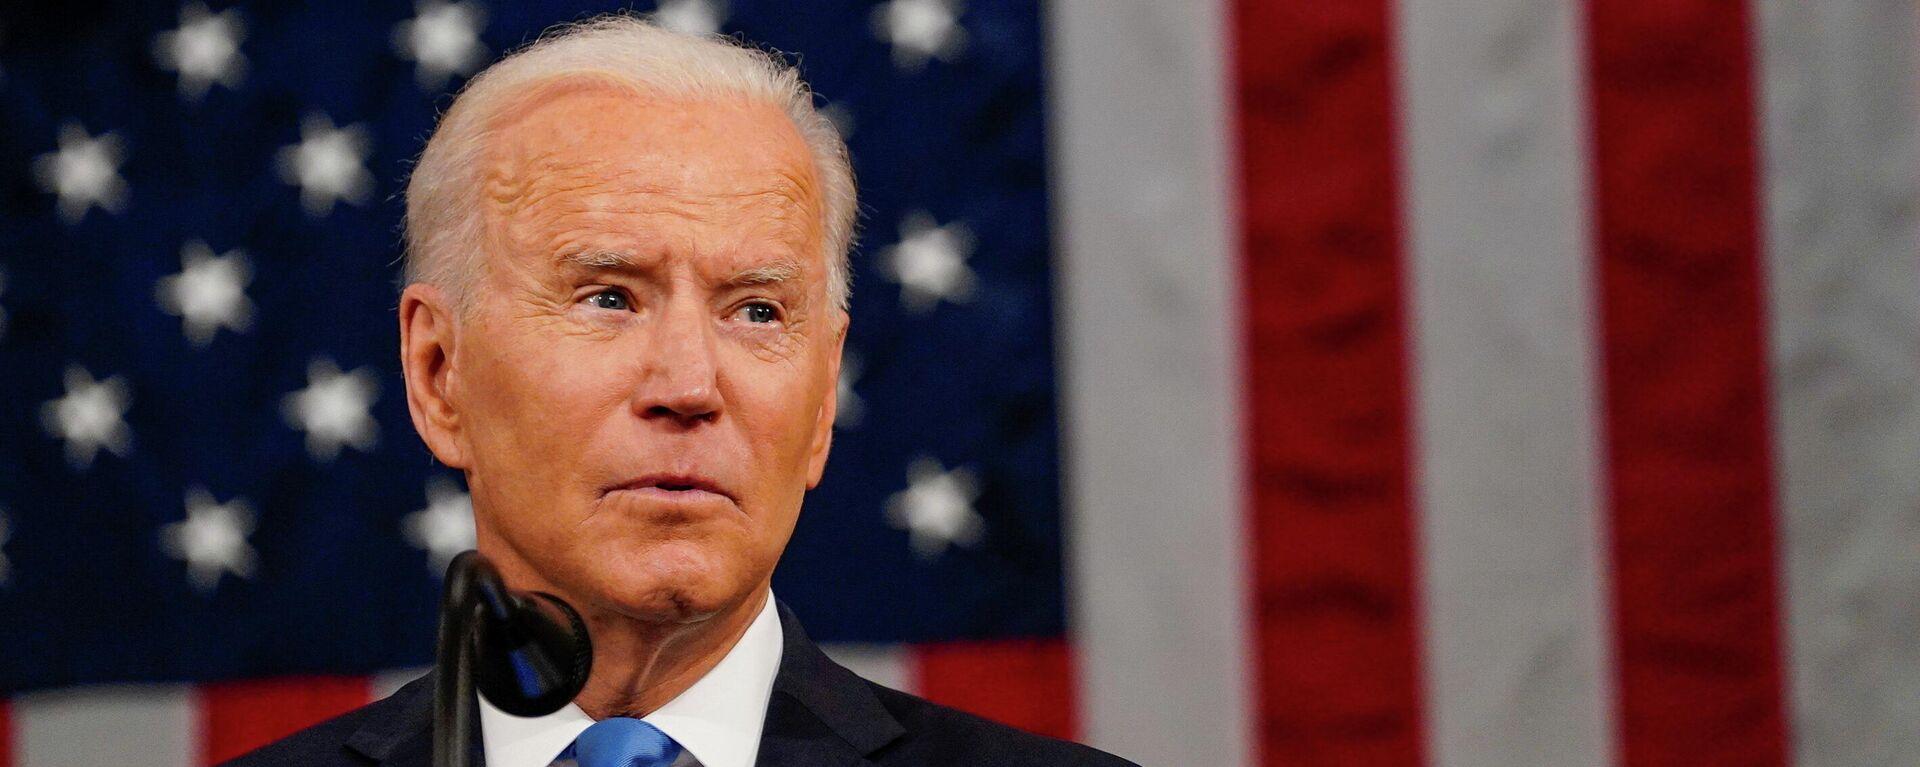 Joe Biden, presidente de EEUU - Sputnik Mundo, 1920, 04.05.2021